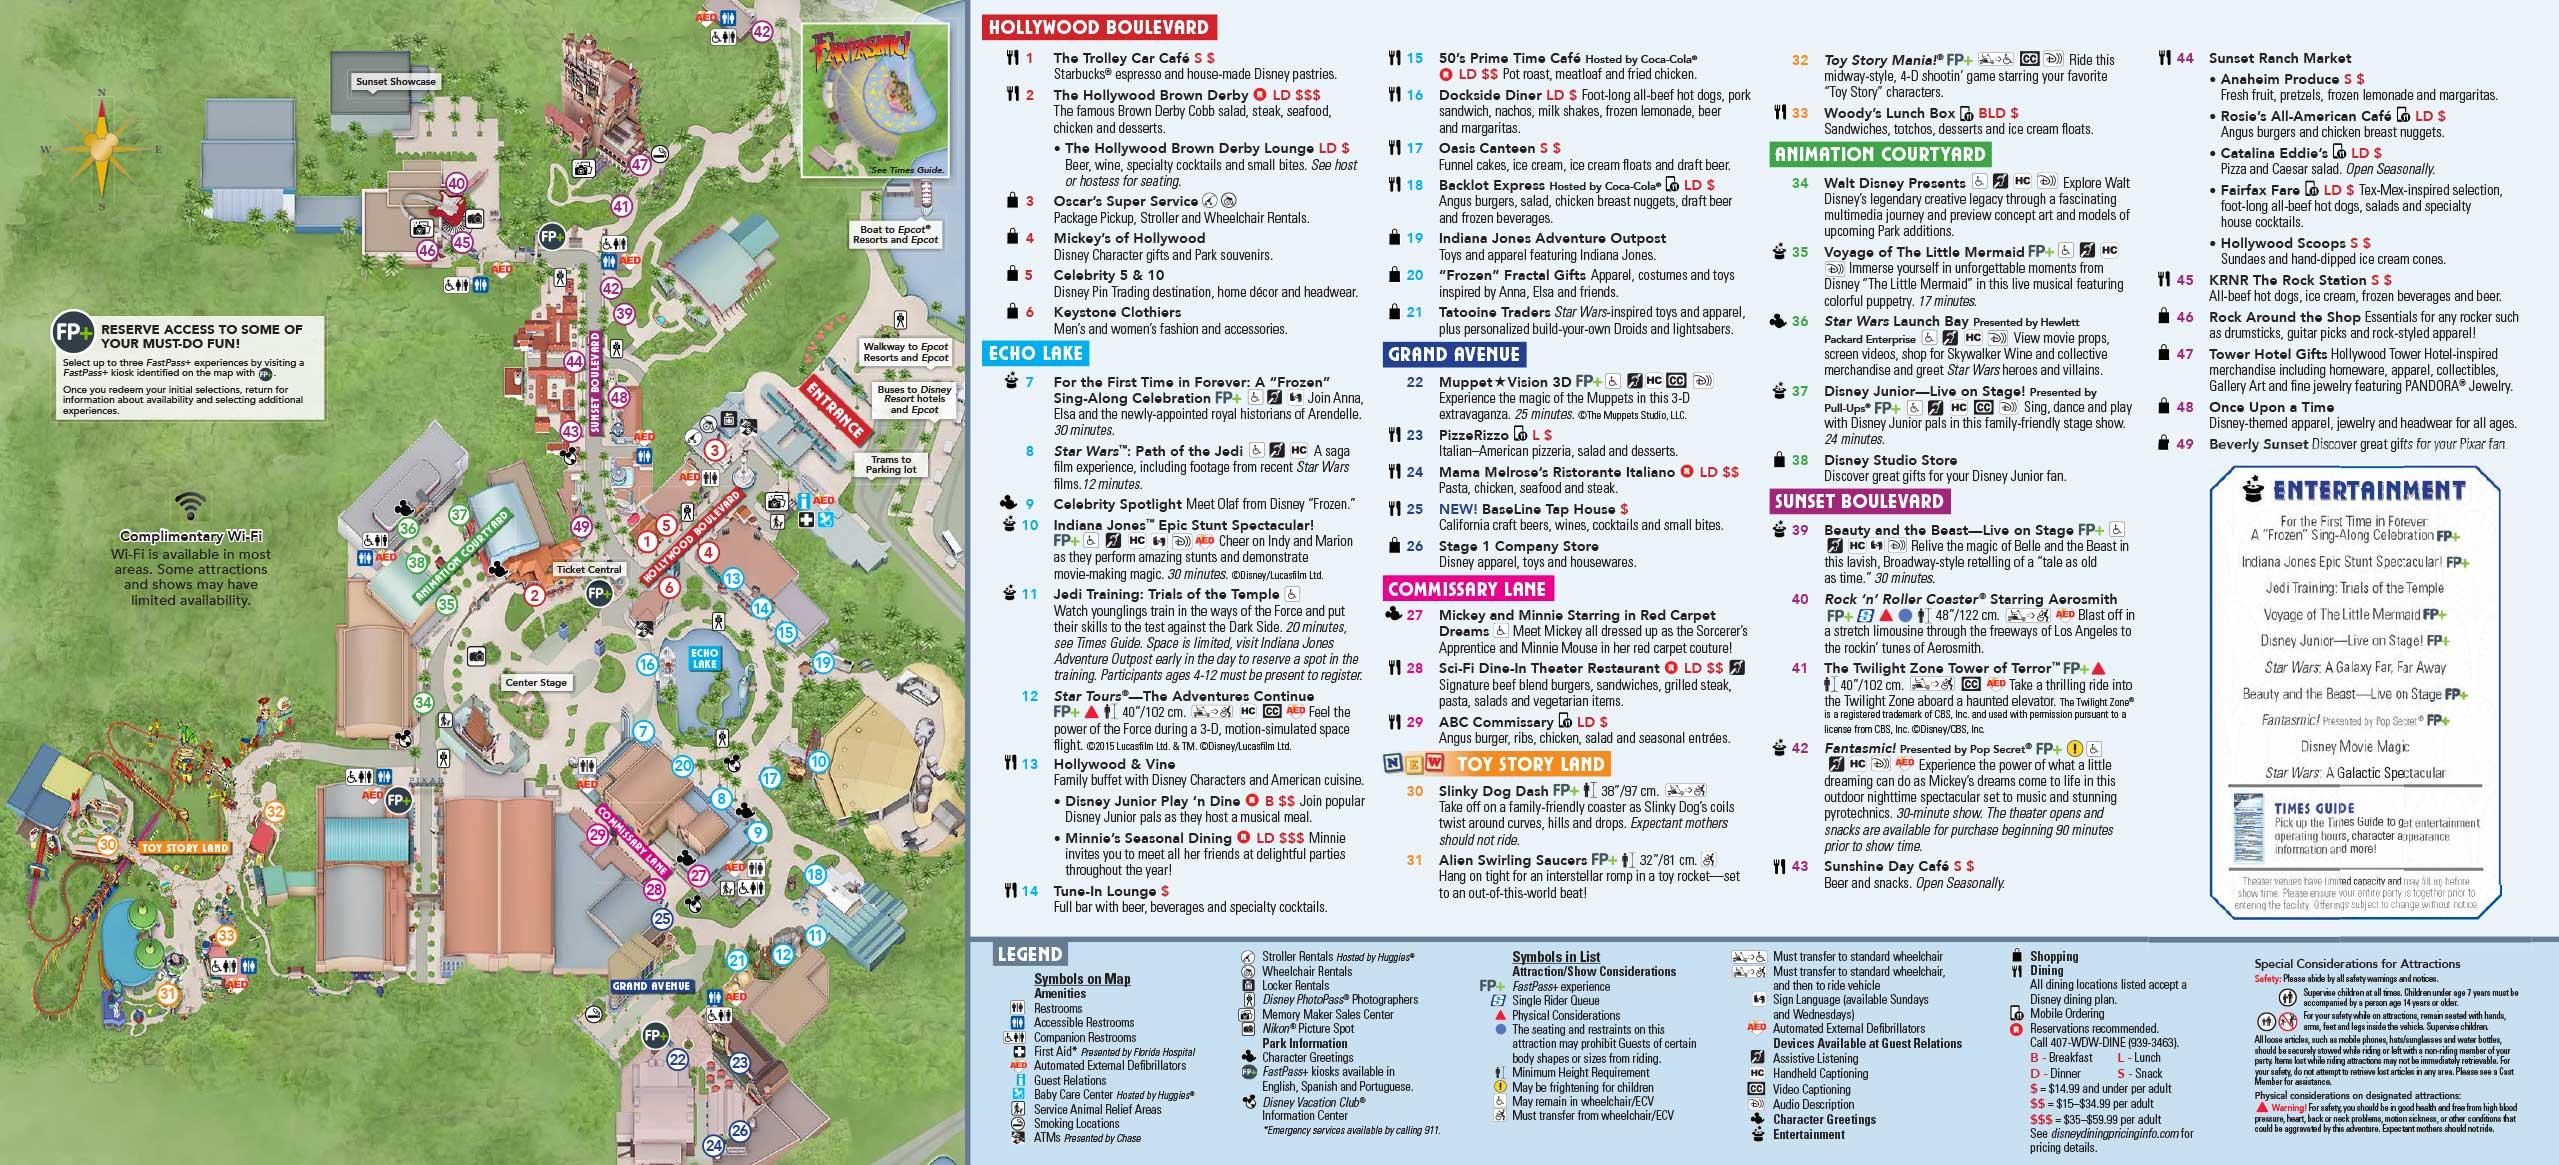 Disney World Map Hollywood Studios.Photos New Guide Map For Disney S Hollywood Studios